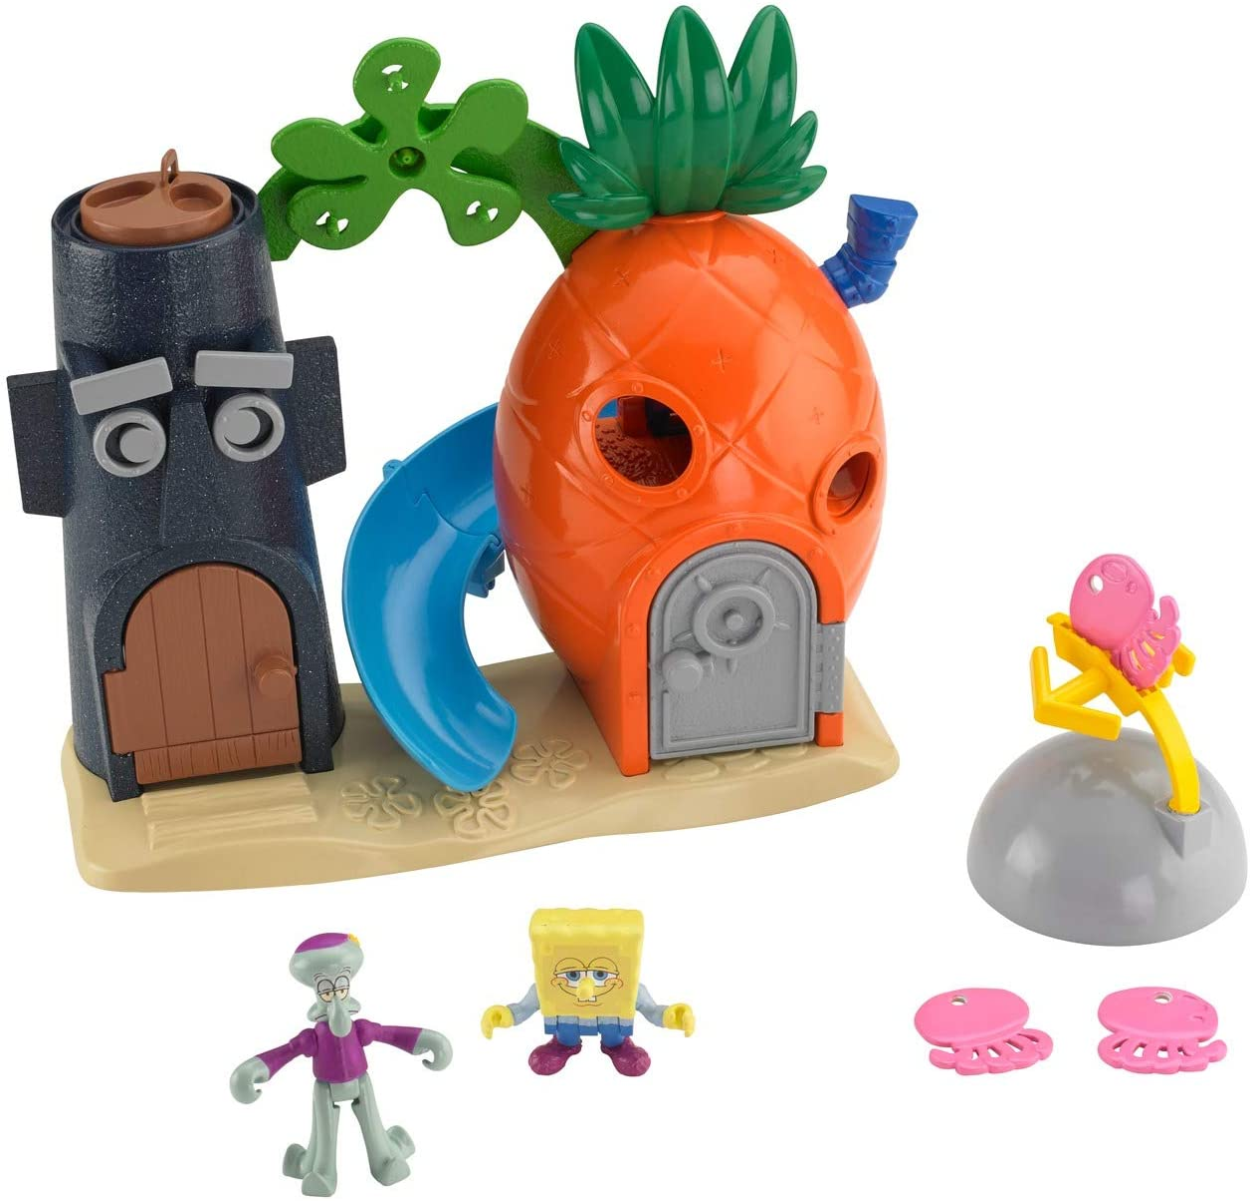 Fisher-Price Imaginext SpongeBob Bikini Bottom Playset, Preschool Toy for Kids 3 Years and Up, Amazon Exclusive